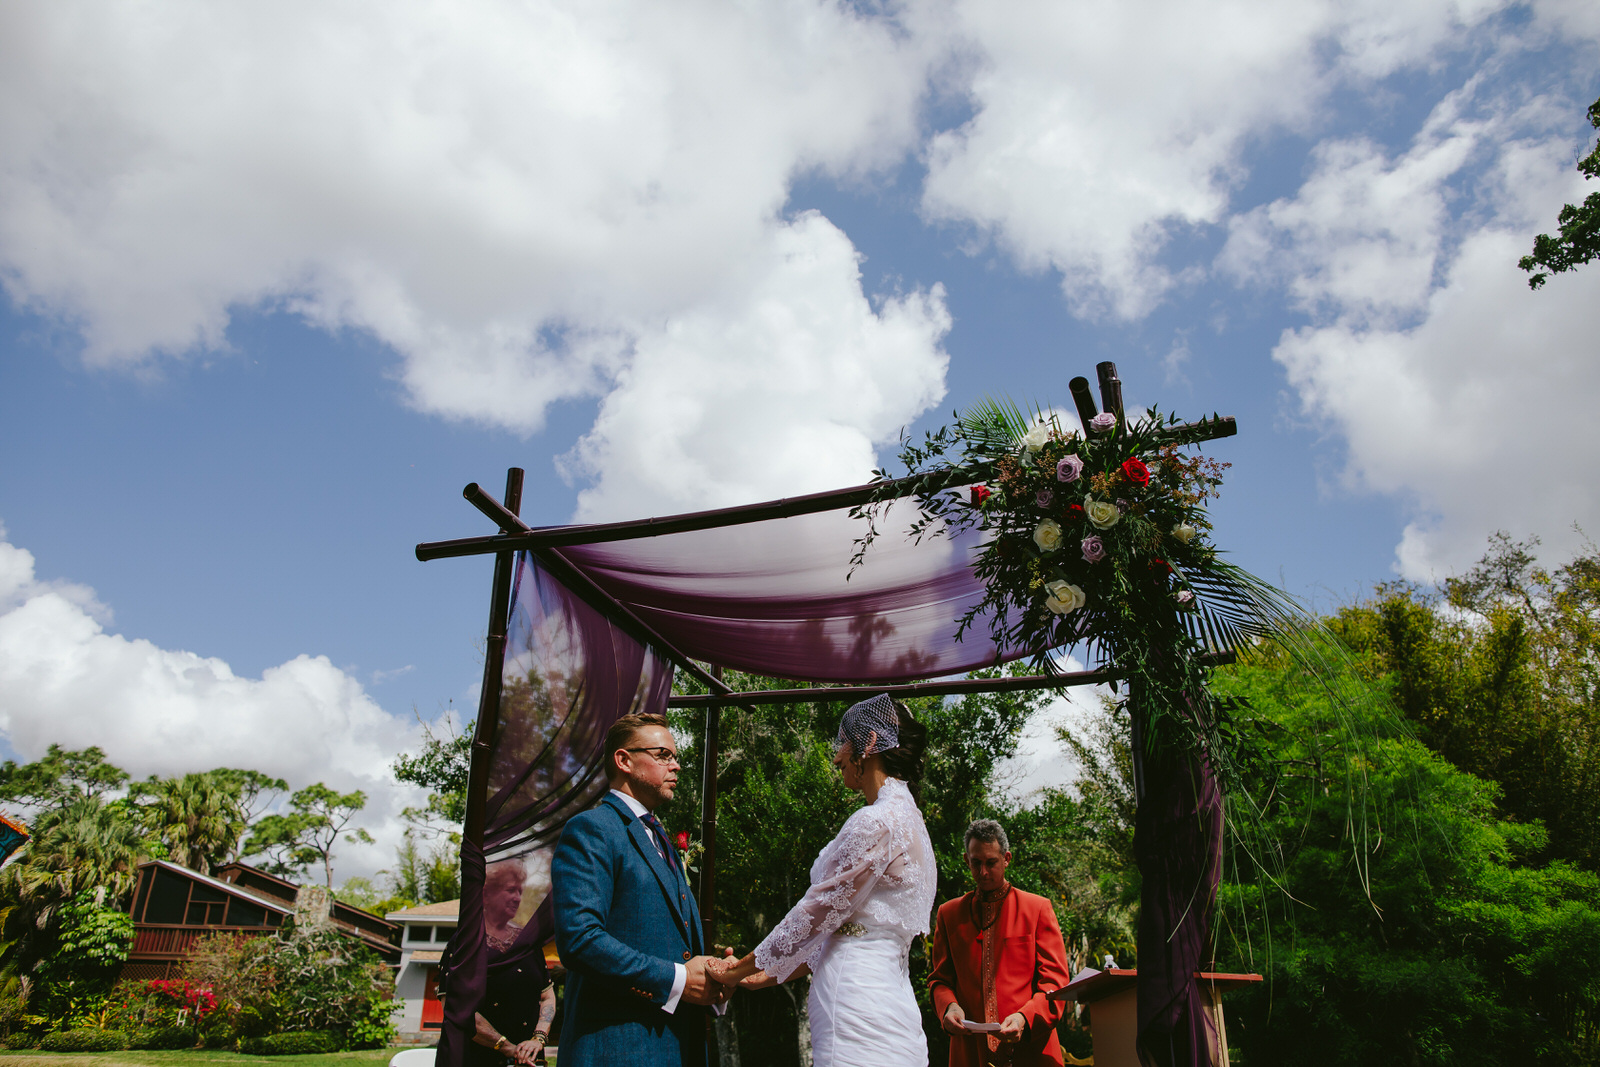 kashi-ashram-wedding-ceremony-sebastian-florida-tiny-house-photo-9.jpg